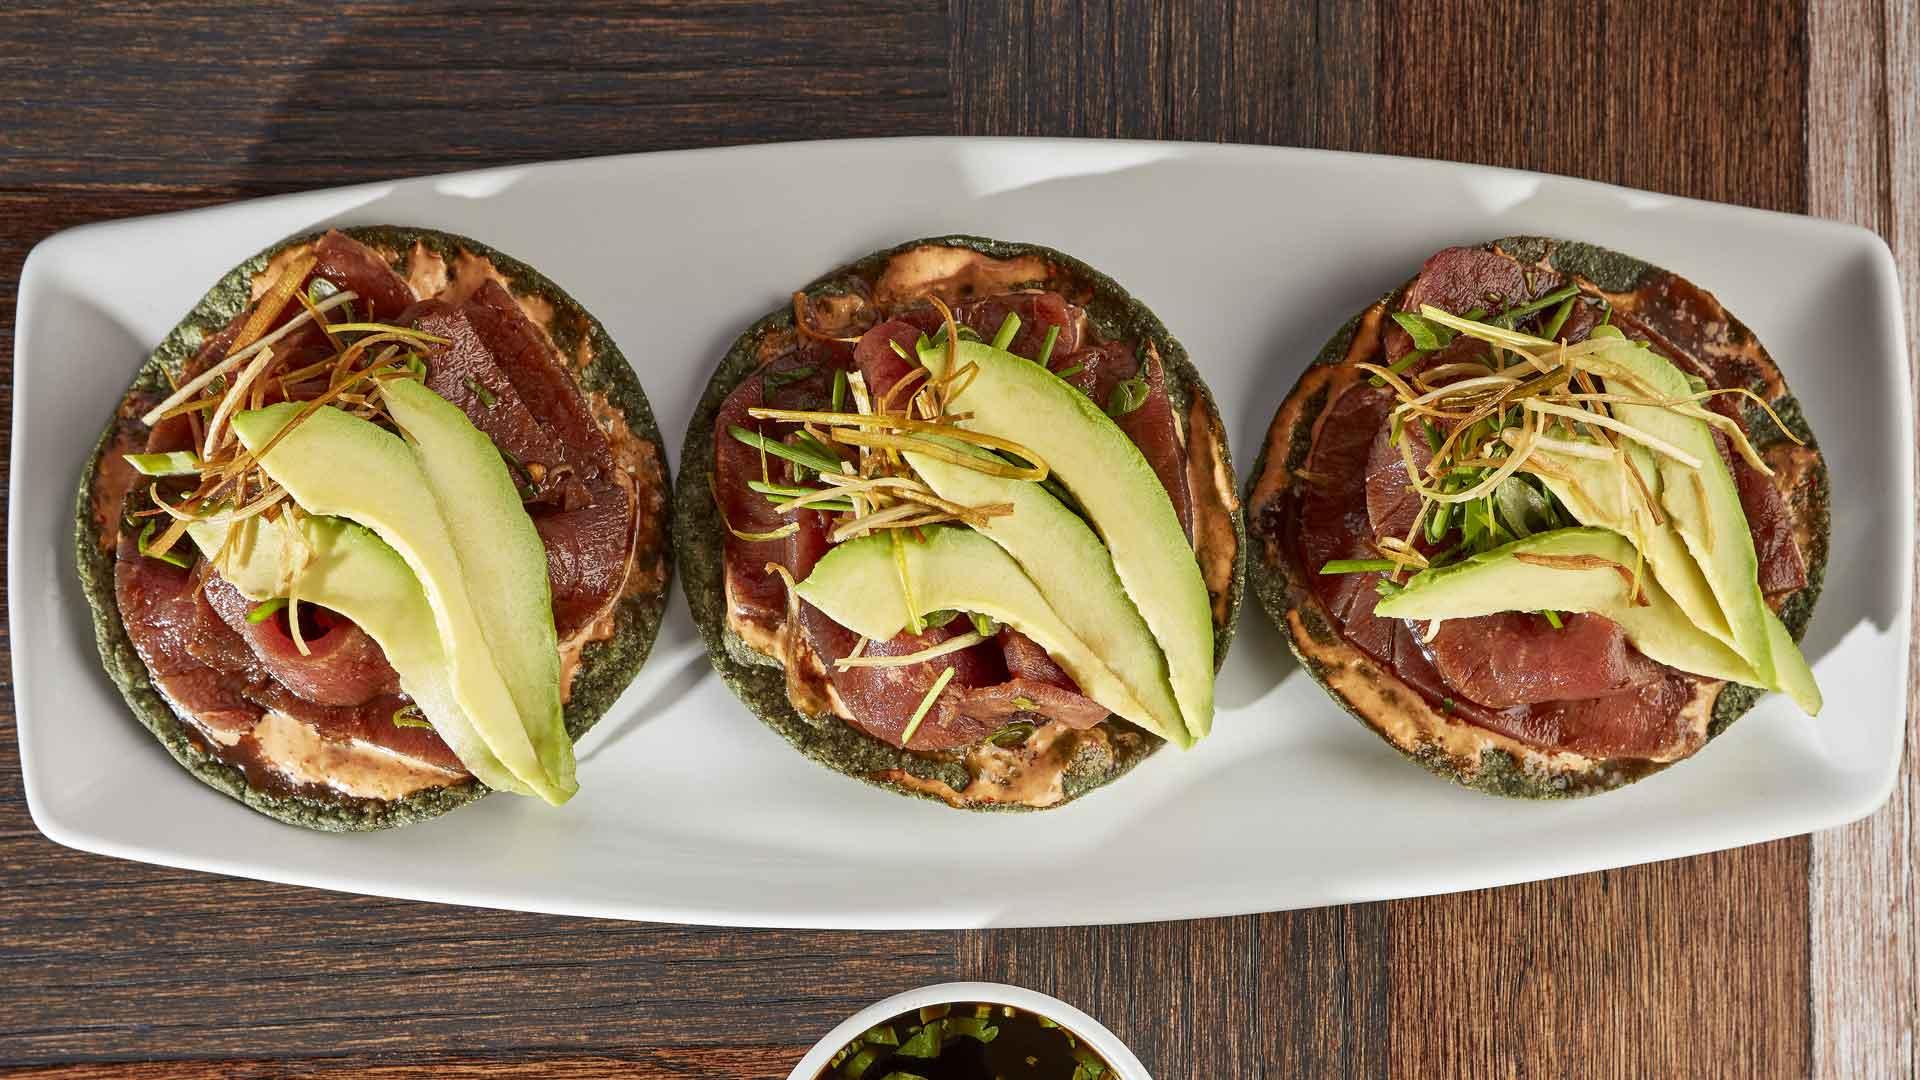 Platillos imperdibles del nuevo menú de Bistró Chapultepec